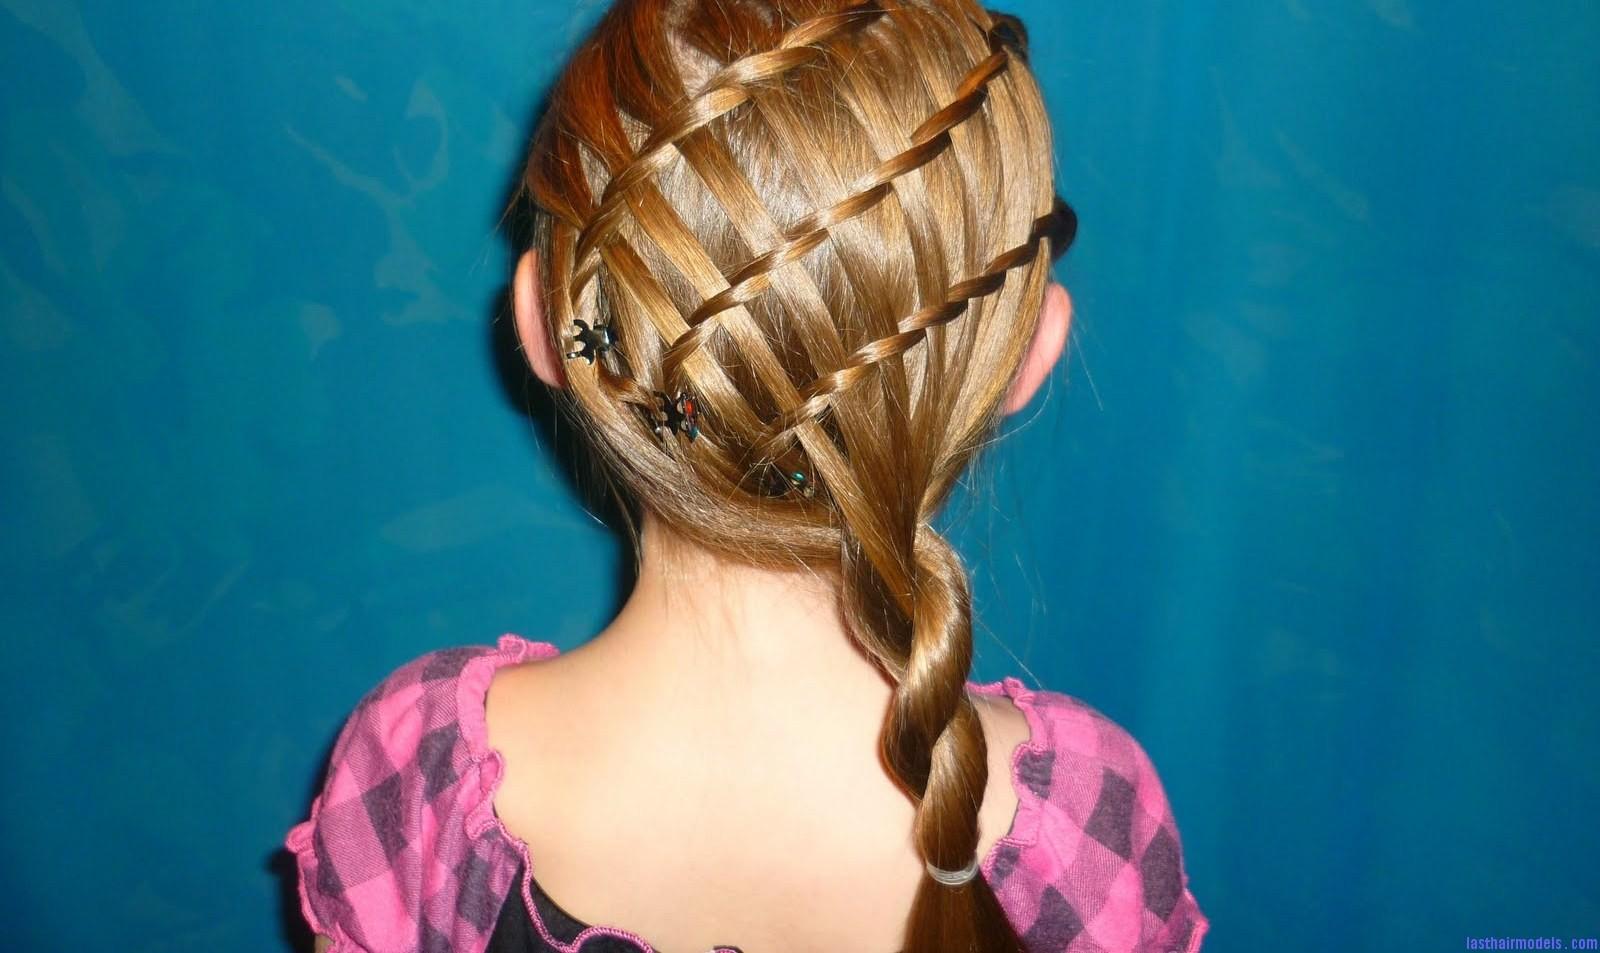 Twisty Braid Last Hair Models Hair Styles Last Hair Models